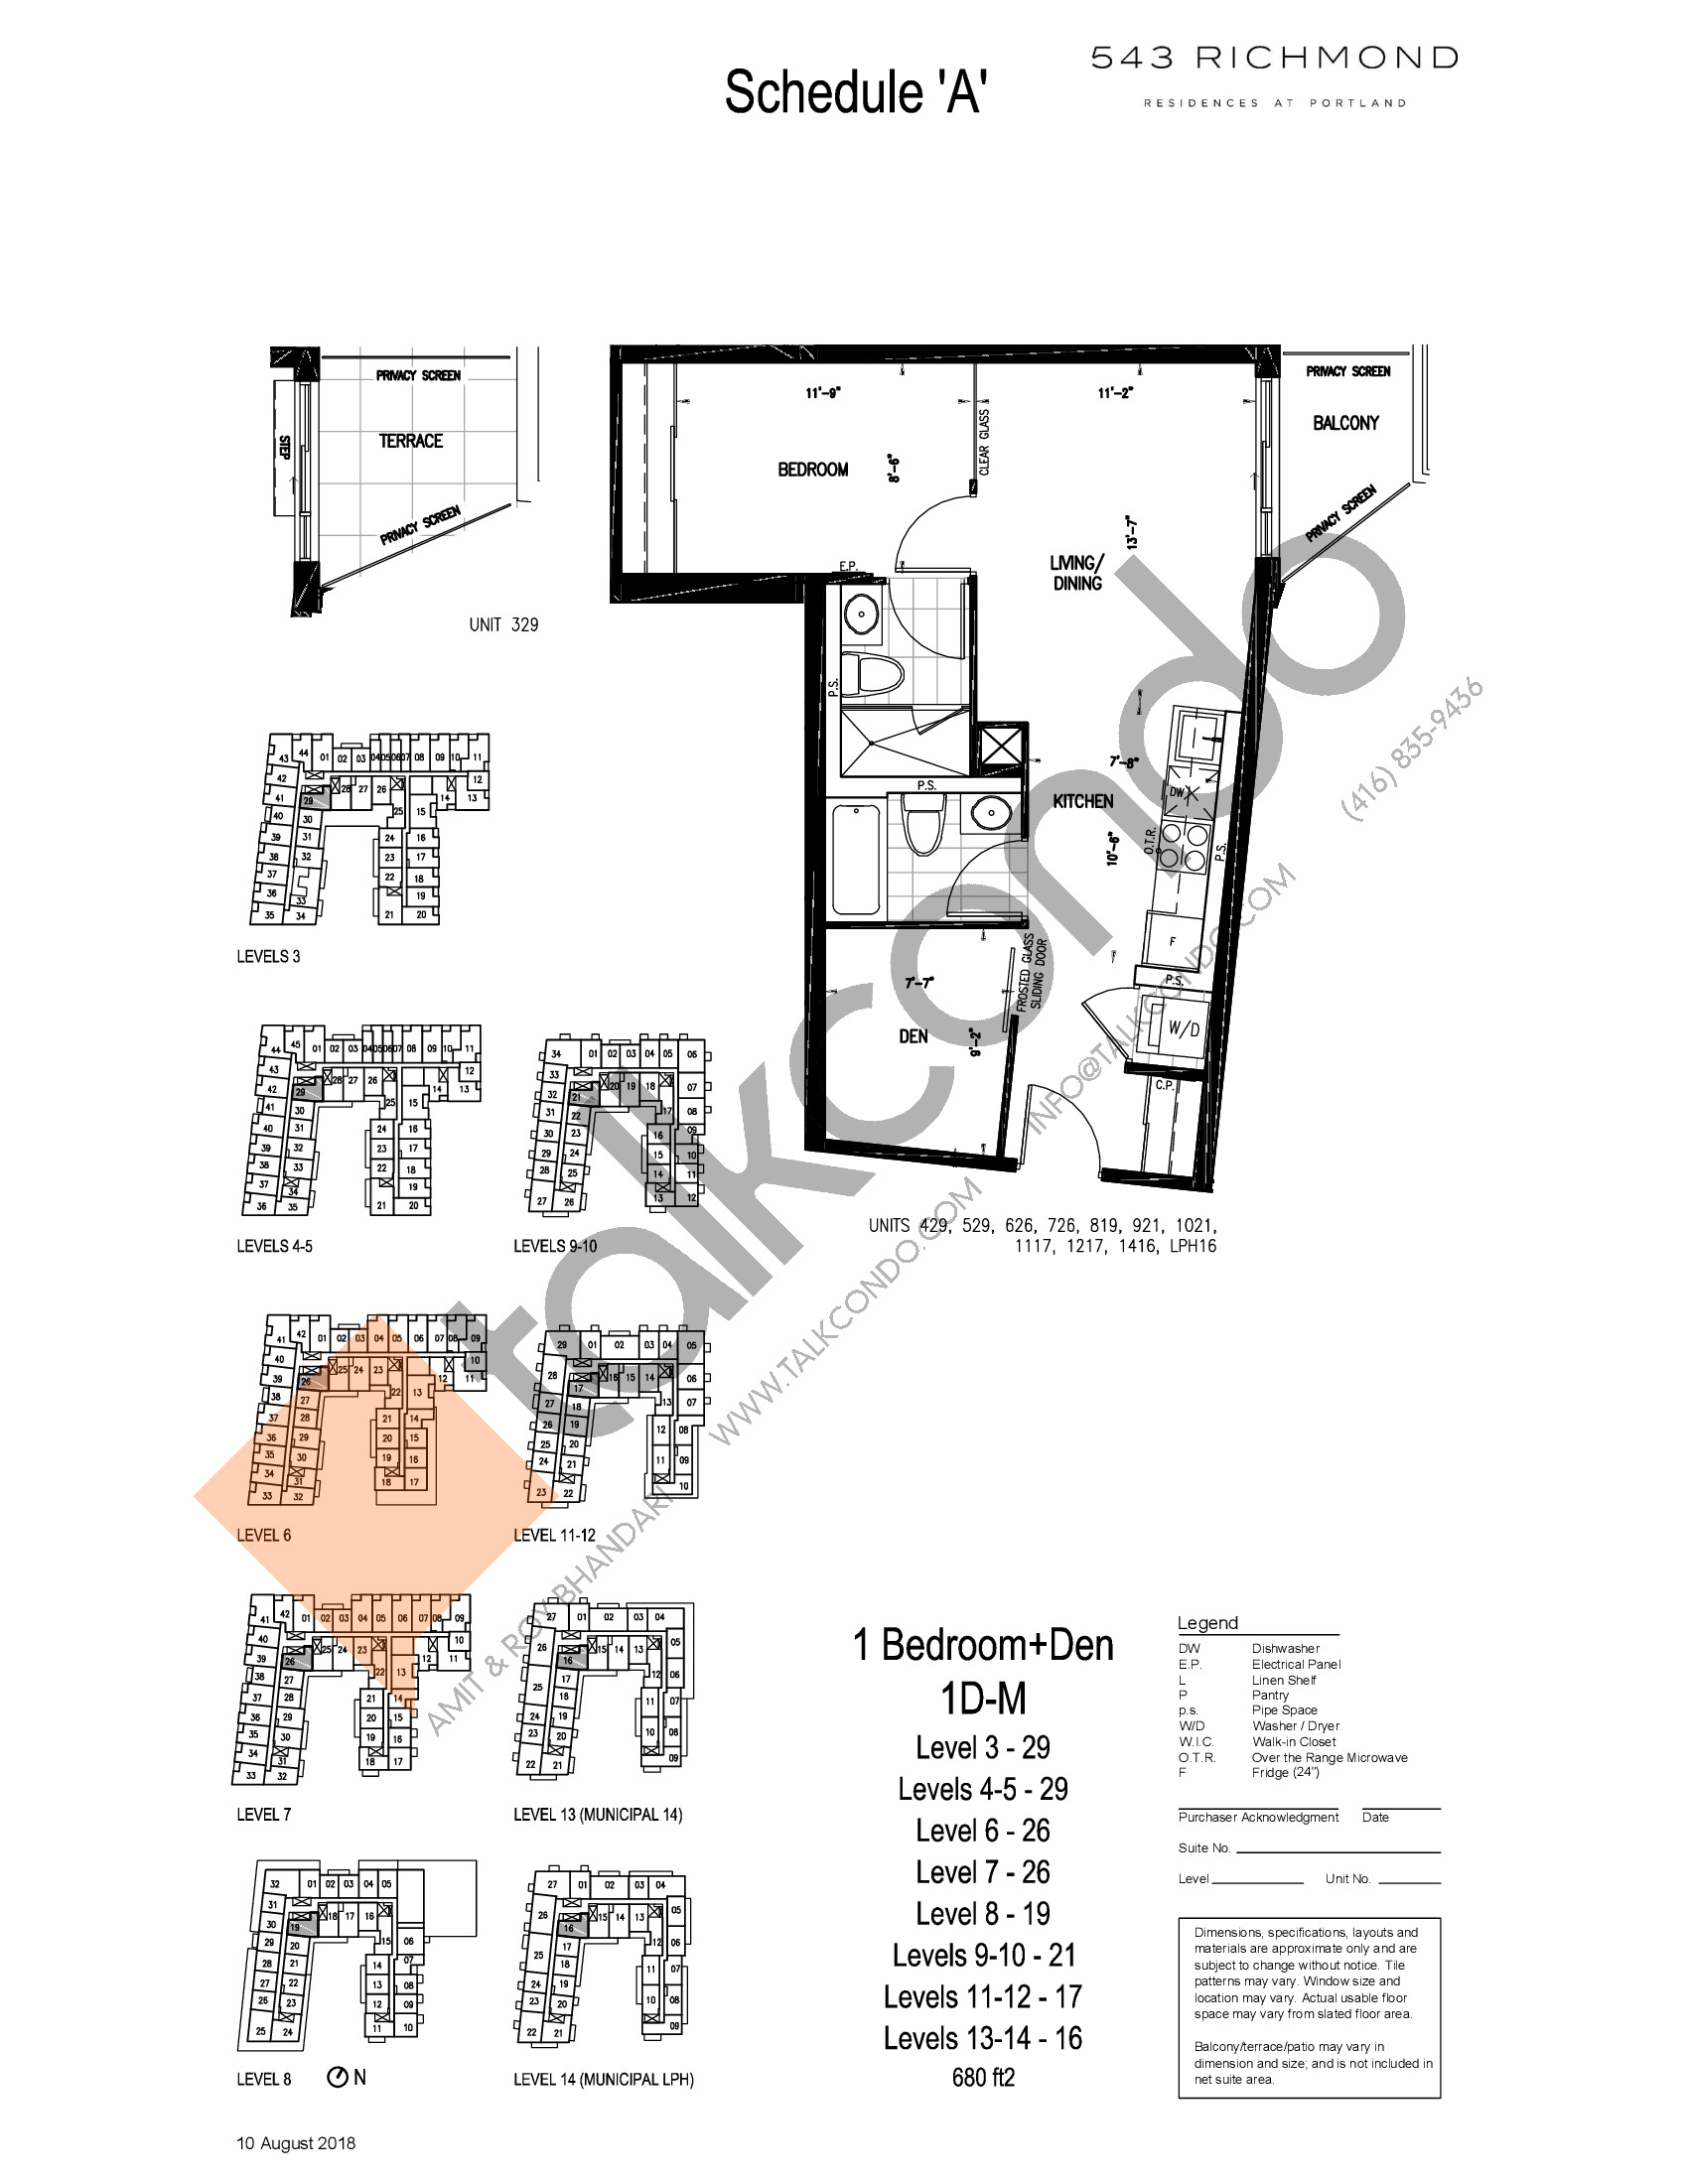 1D-M Floor Plan at 543 Richmond St Condos - 680 sq.ft